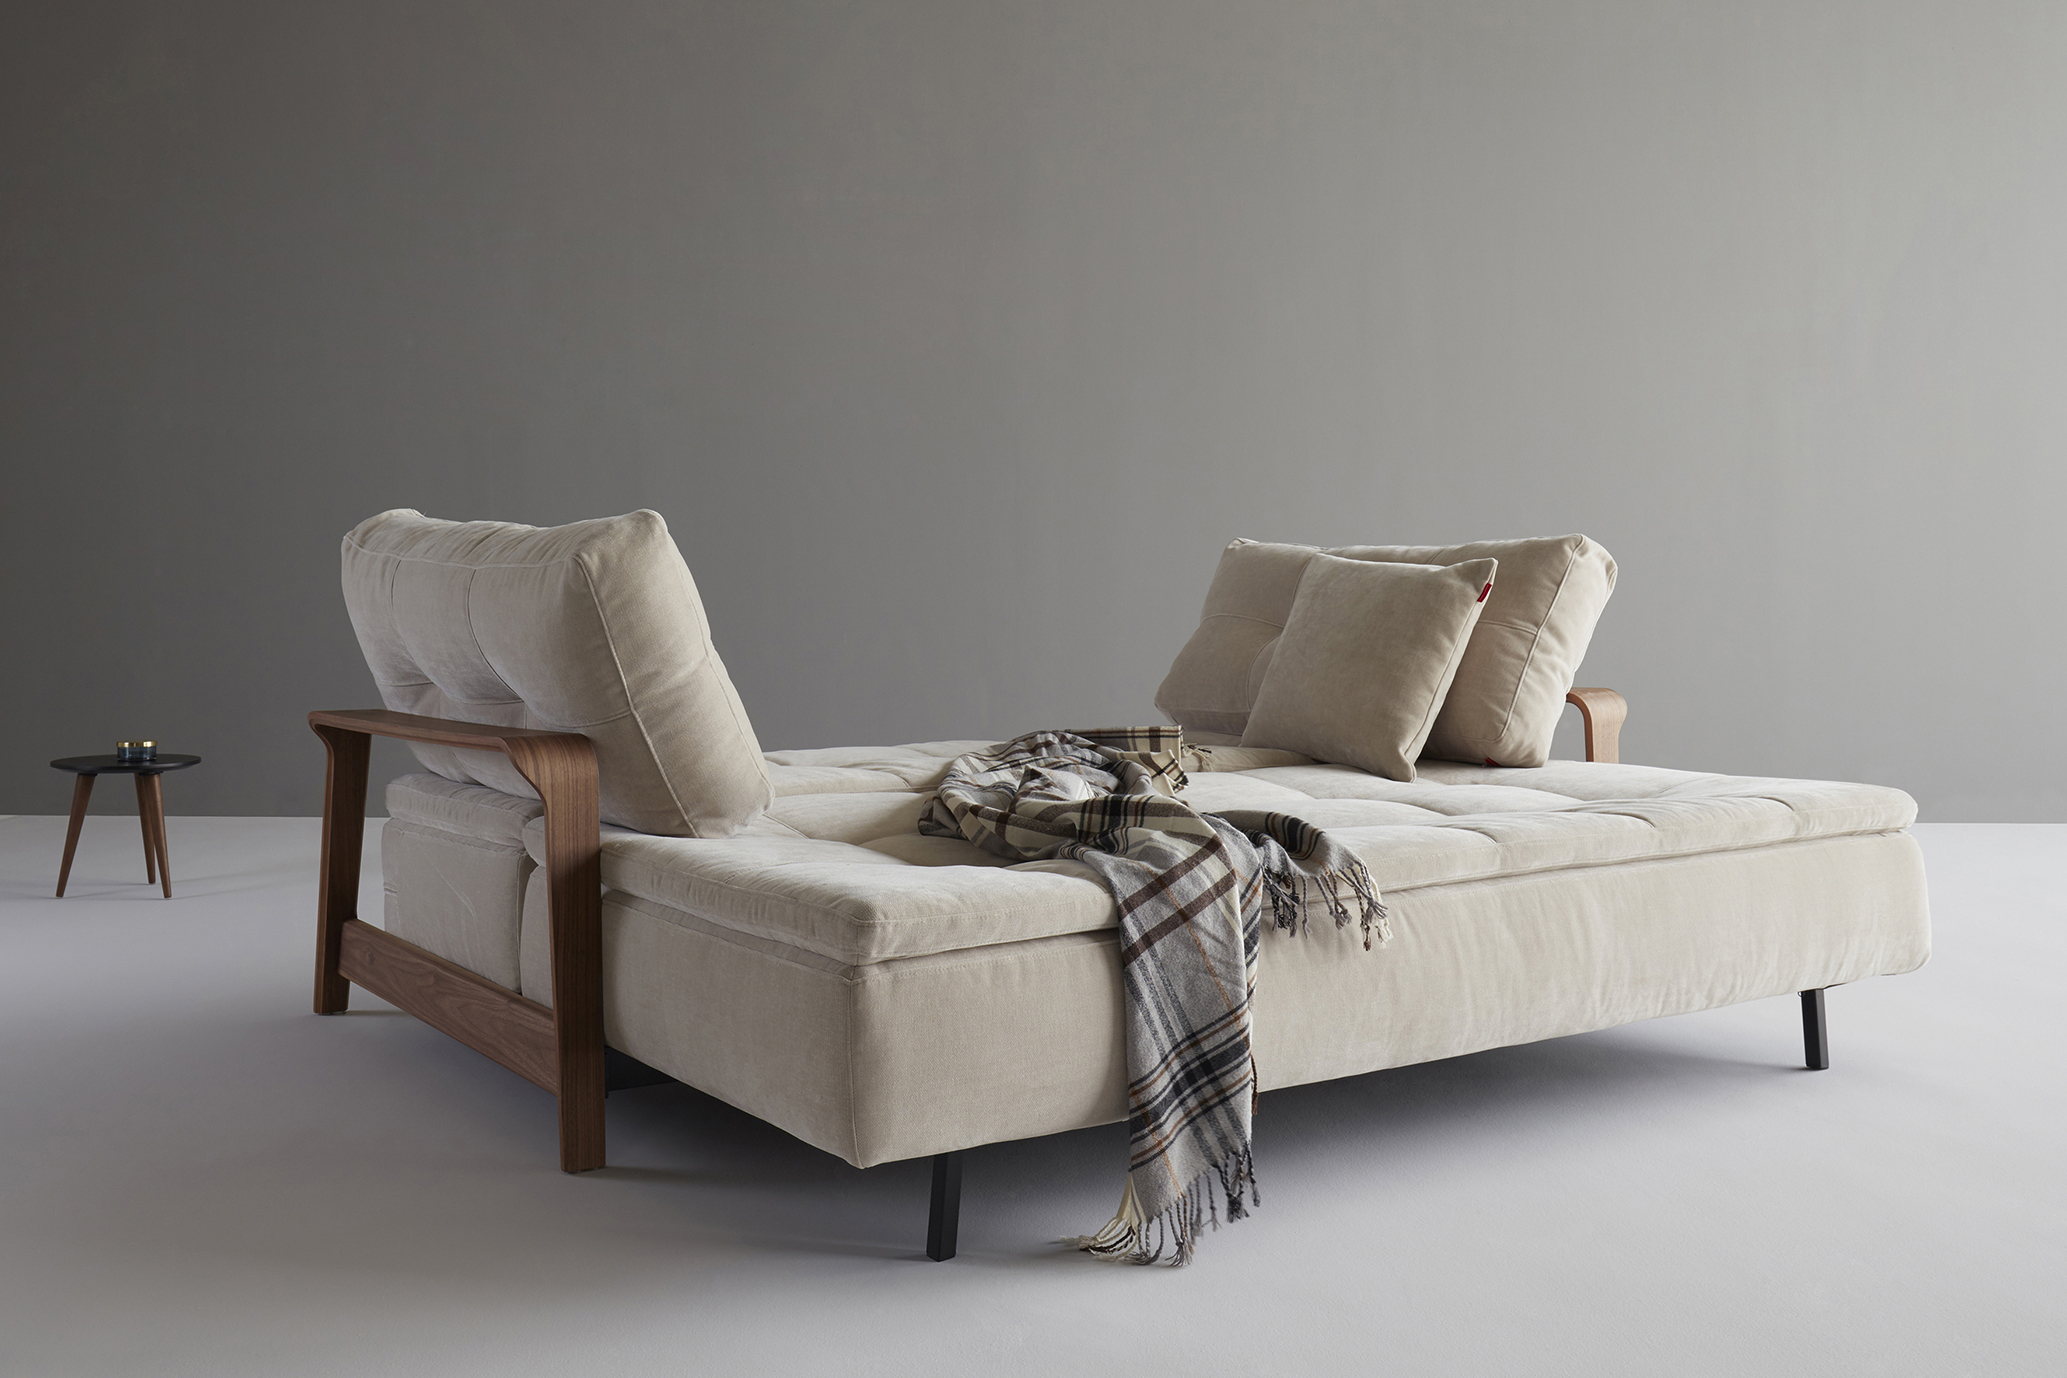 Ran-sofa-oliver-lukas-weisskrogh-1.jpg